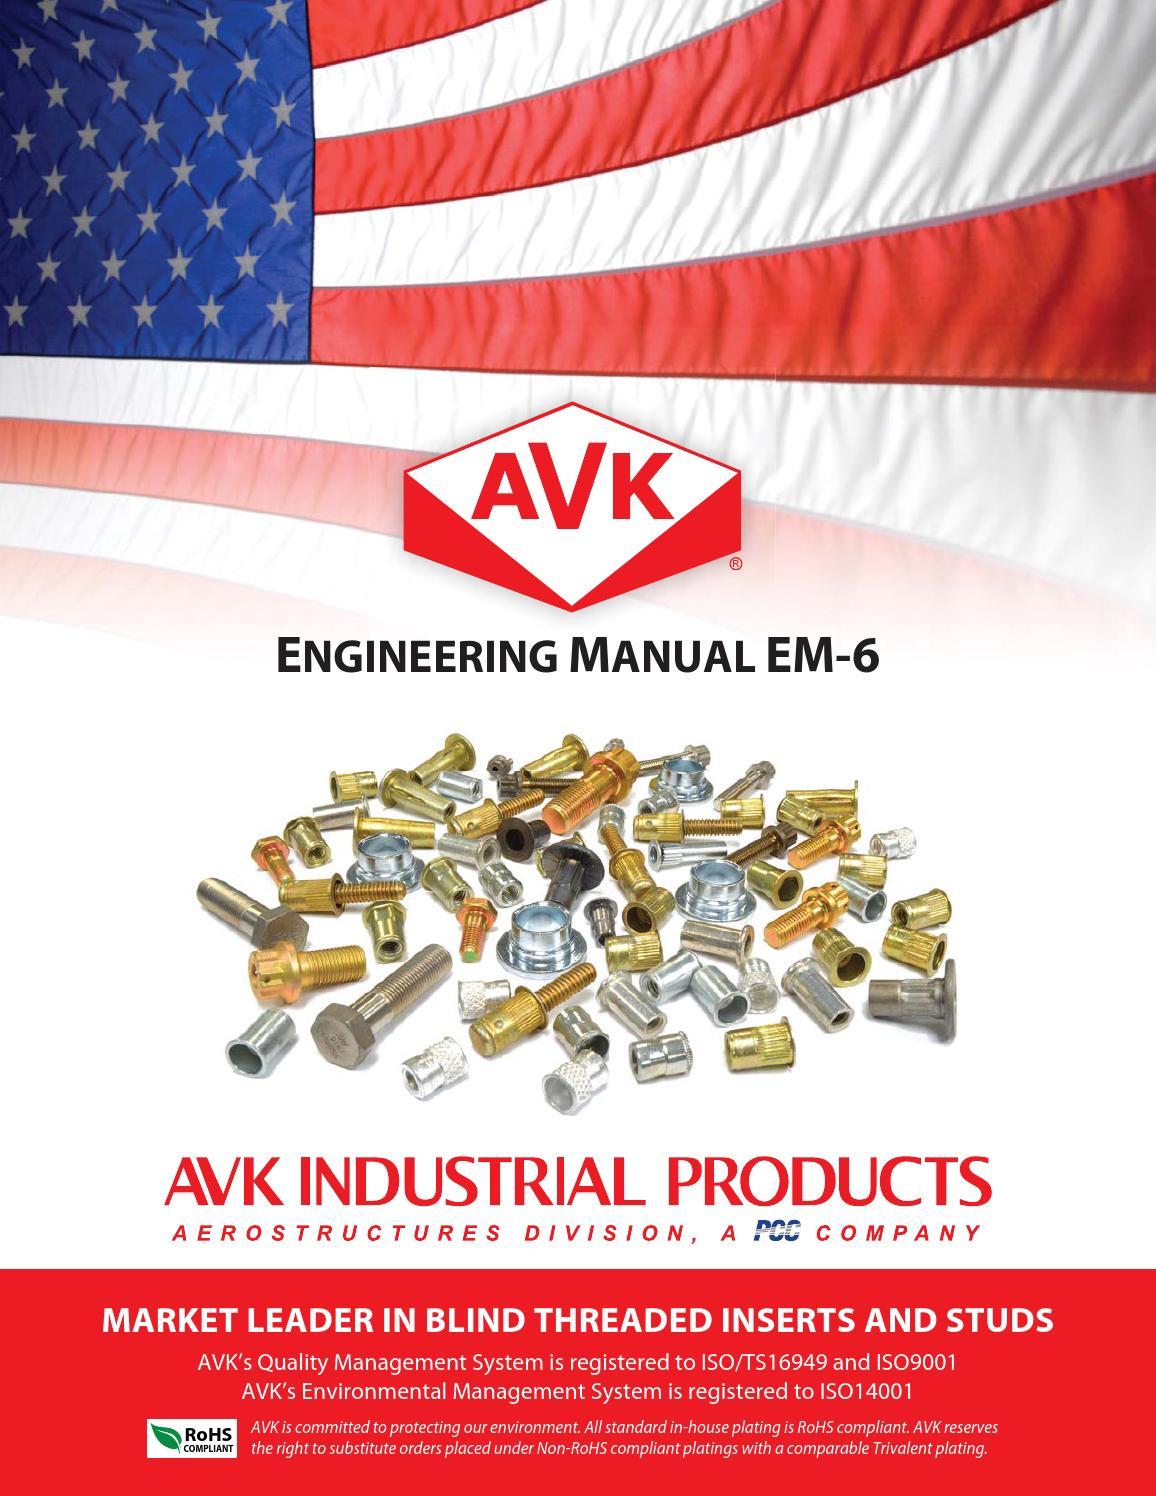 M10 x 1.5 AKPT6P1015 Insert Installation Tool AVK Steel